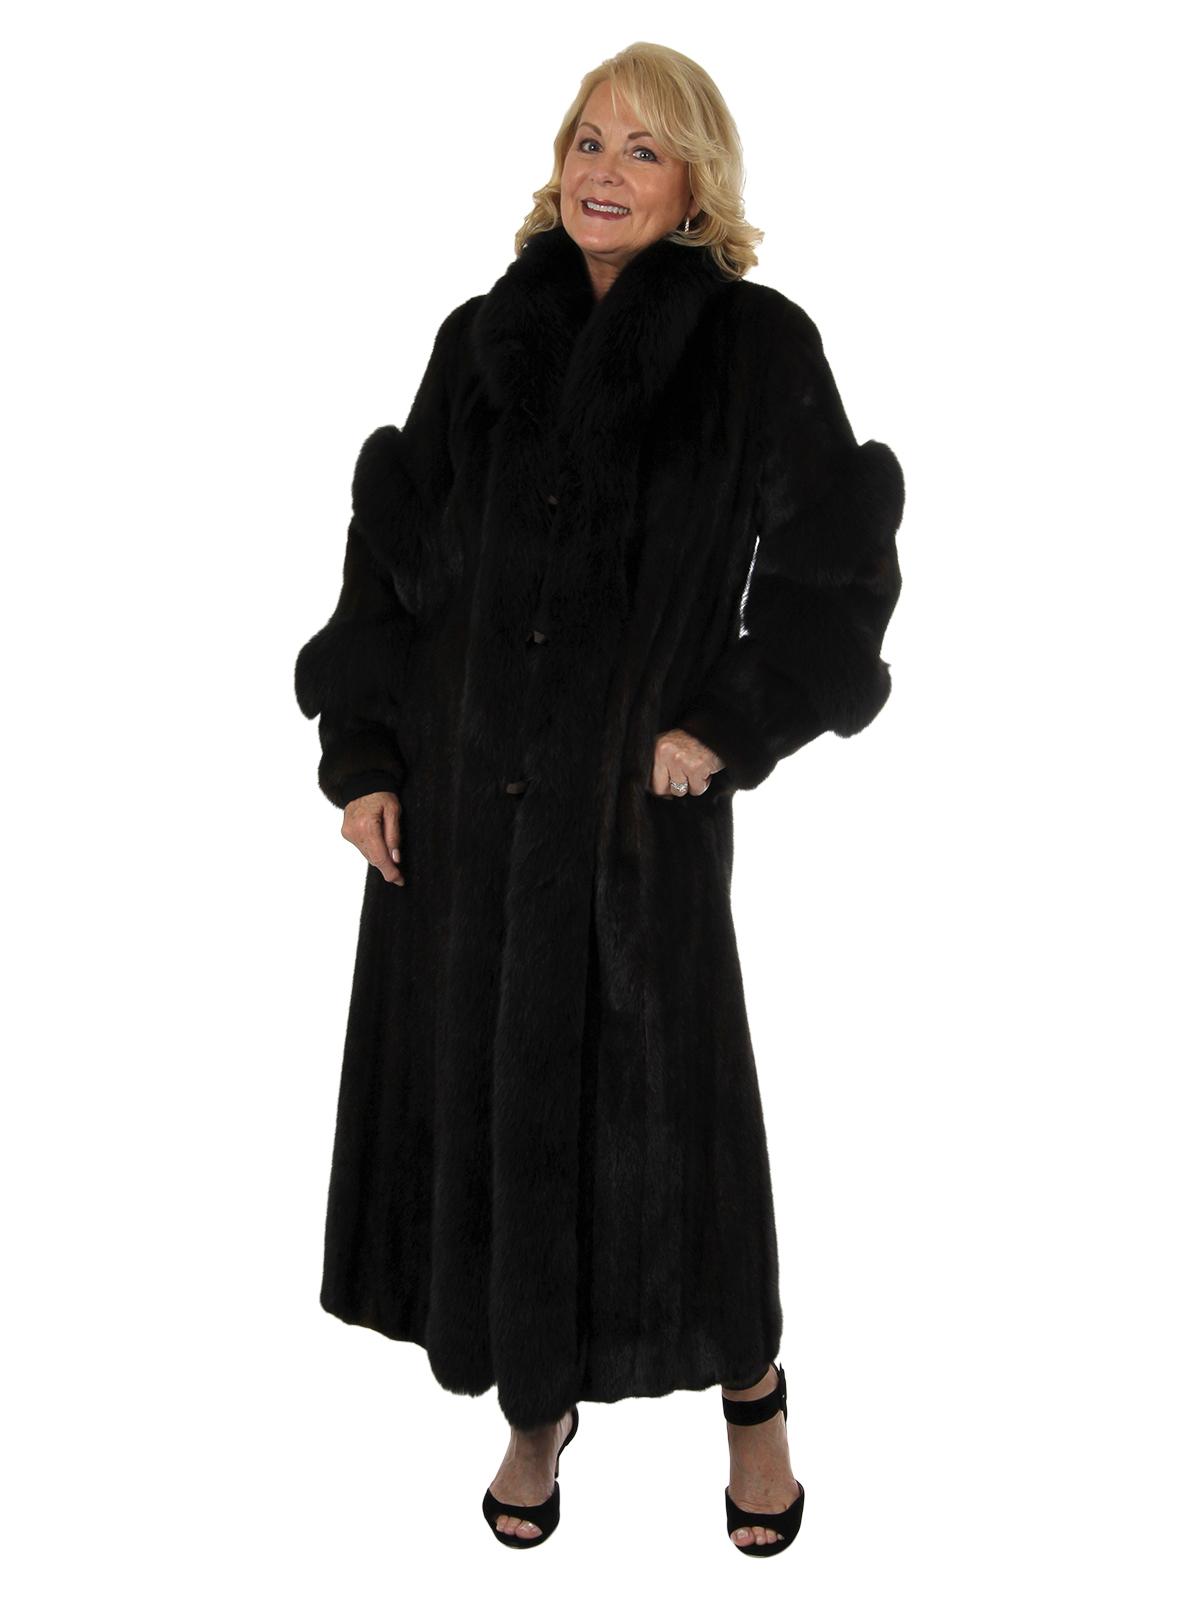 Woman's New Deep Mahogany Female Mink Fur Coat with Fox Trim